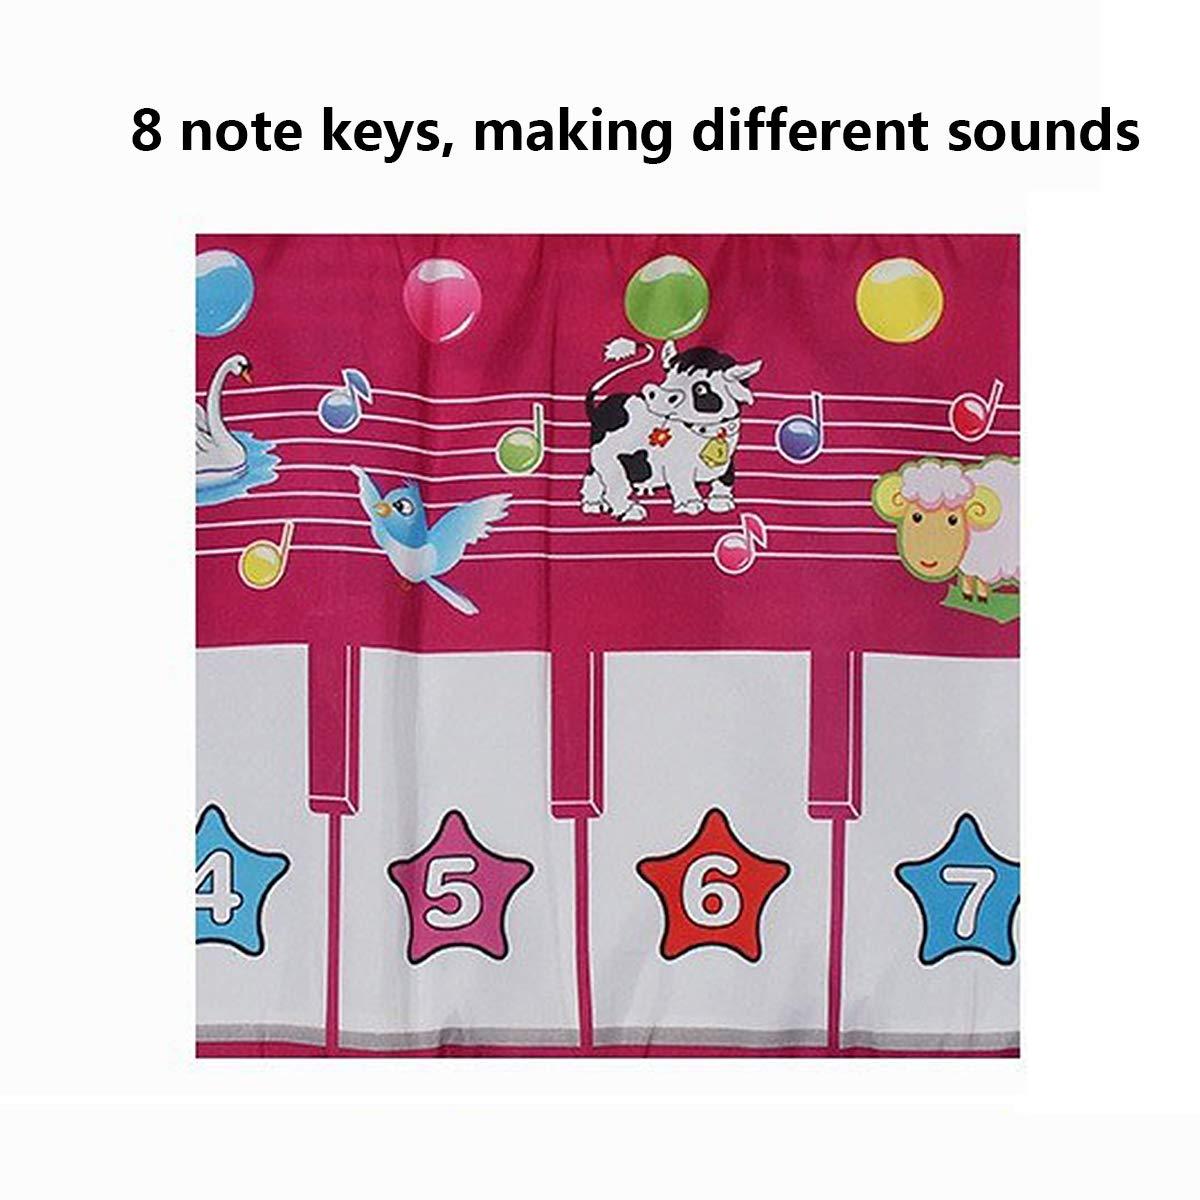 Children's Electronic Piano Mat, Electronic Music Playmat Piano Mat Cartoon Animal Fun Crawling Blanket by Eustoma (Image #6)